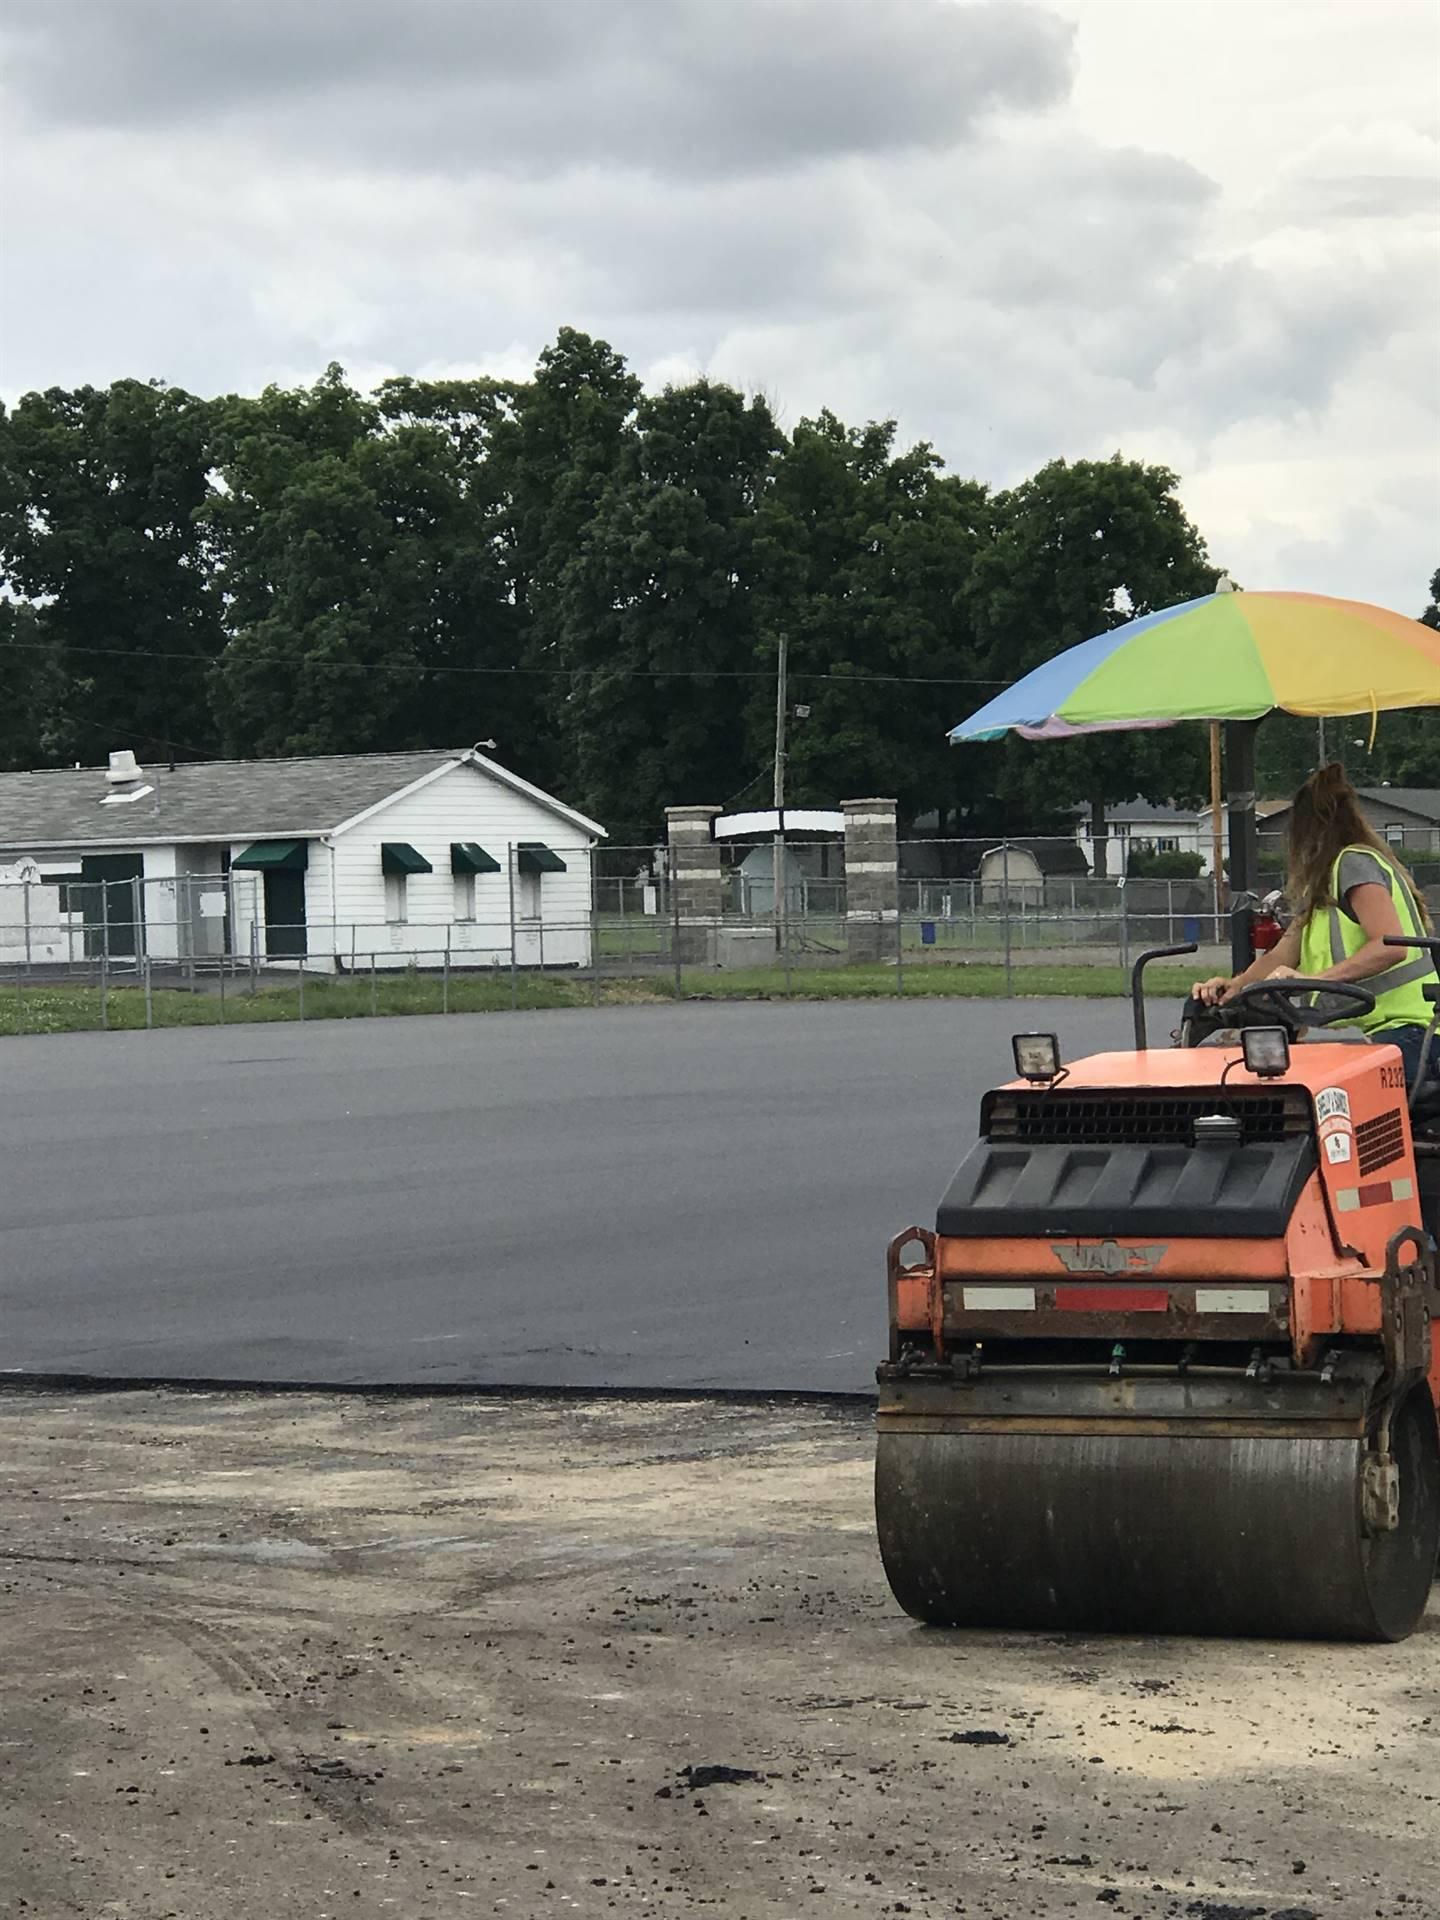 new asphalt being rolled